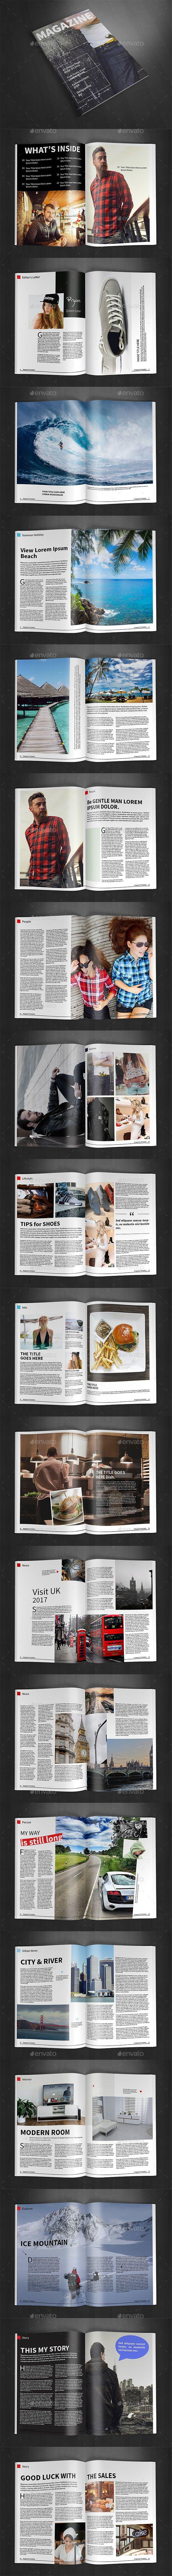 A4 #Magazine Template Vol.24 - Magazines Print #Templates Download here: https://graphicriver.net/item/a4-magazine-template-vol24/19487995?ref=alena994